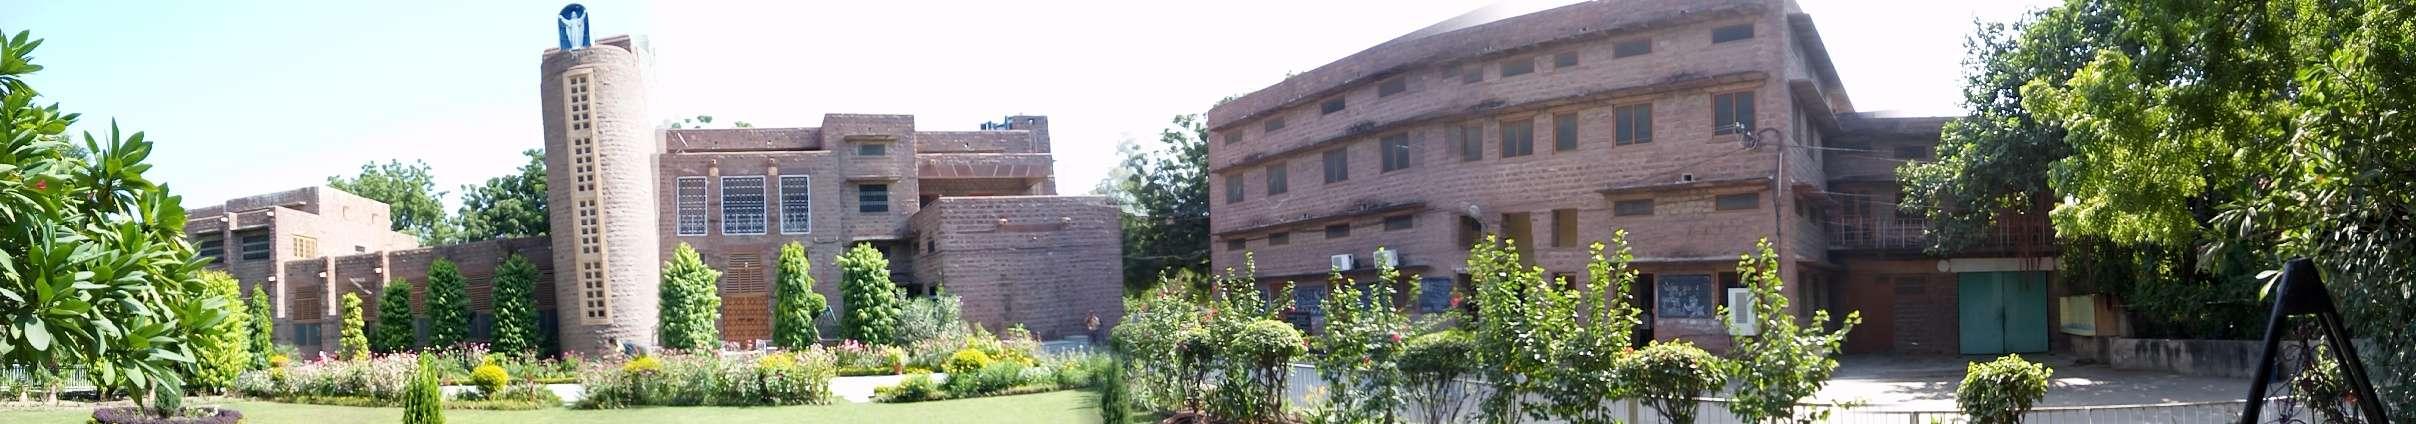 SAINT PATRICK S VIDYA BHAWAN SR SEC SCHOOL NEAR RAILWAY STADIUM JODHPUR RAJASTHAN 1730218